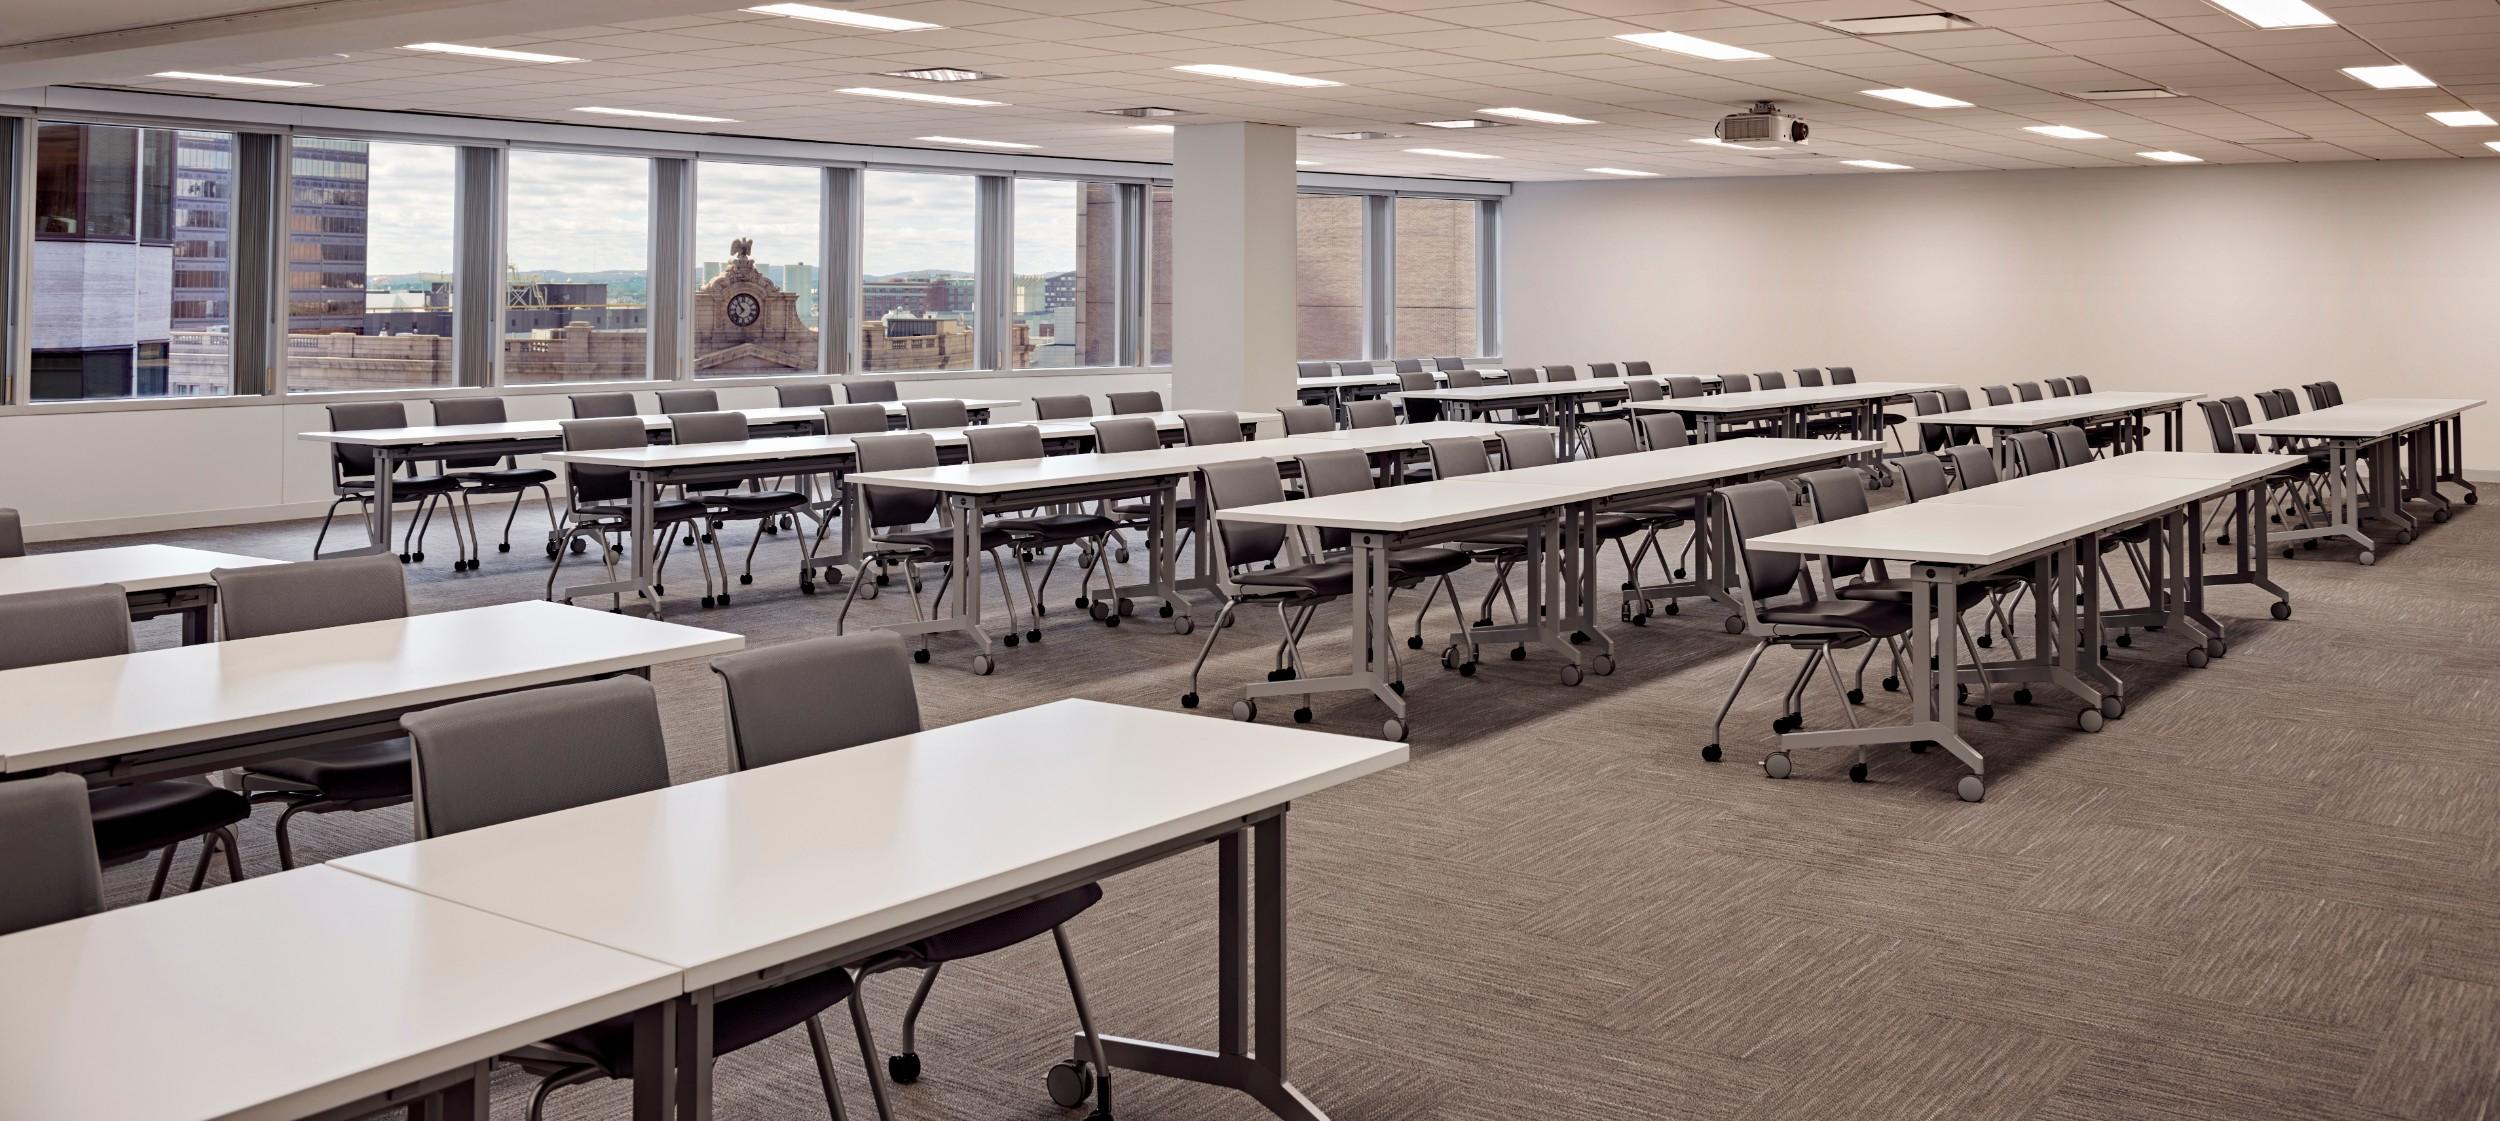 Corderman_Construction_CBRE_Amenity_Center_100_High_Training_Conference_Rooms.jpg